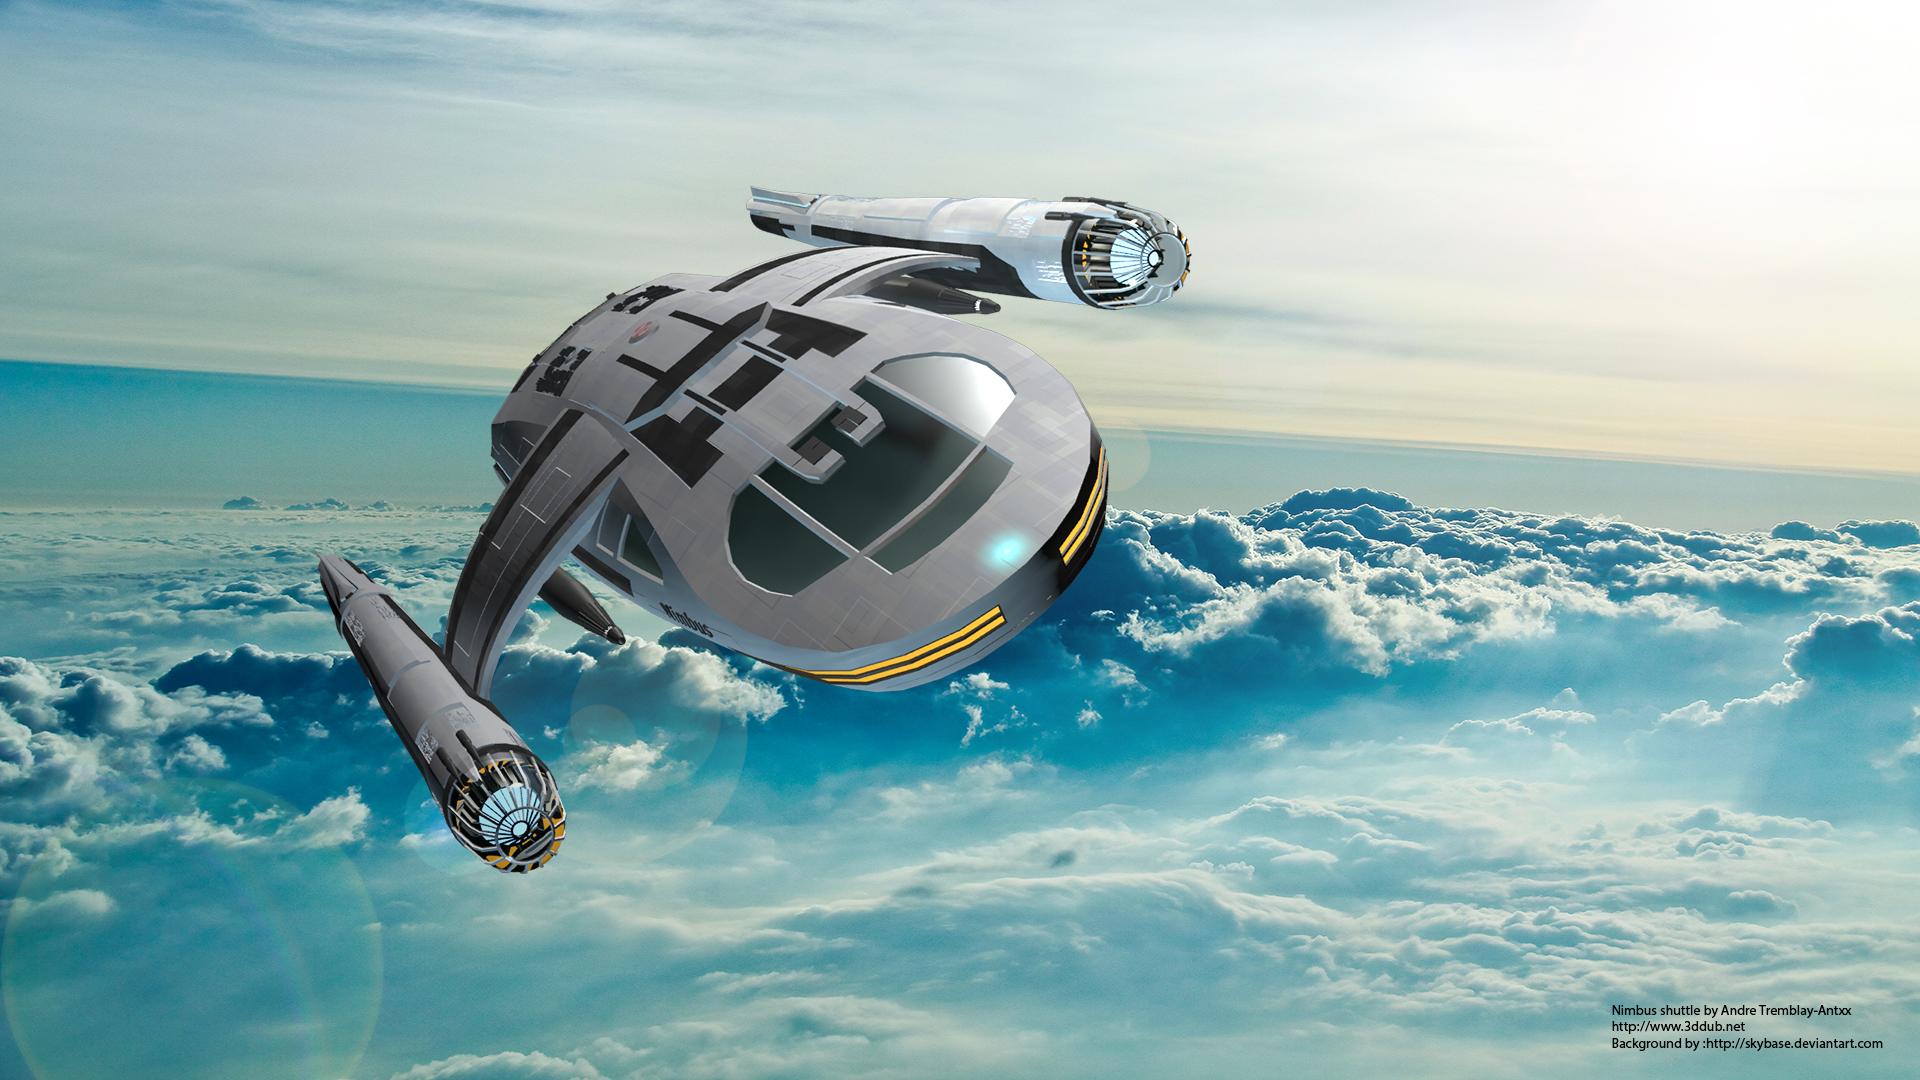 Nimbus shuttle